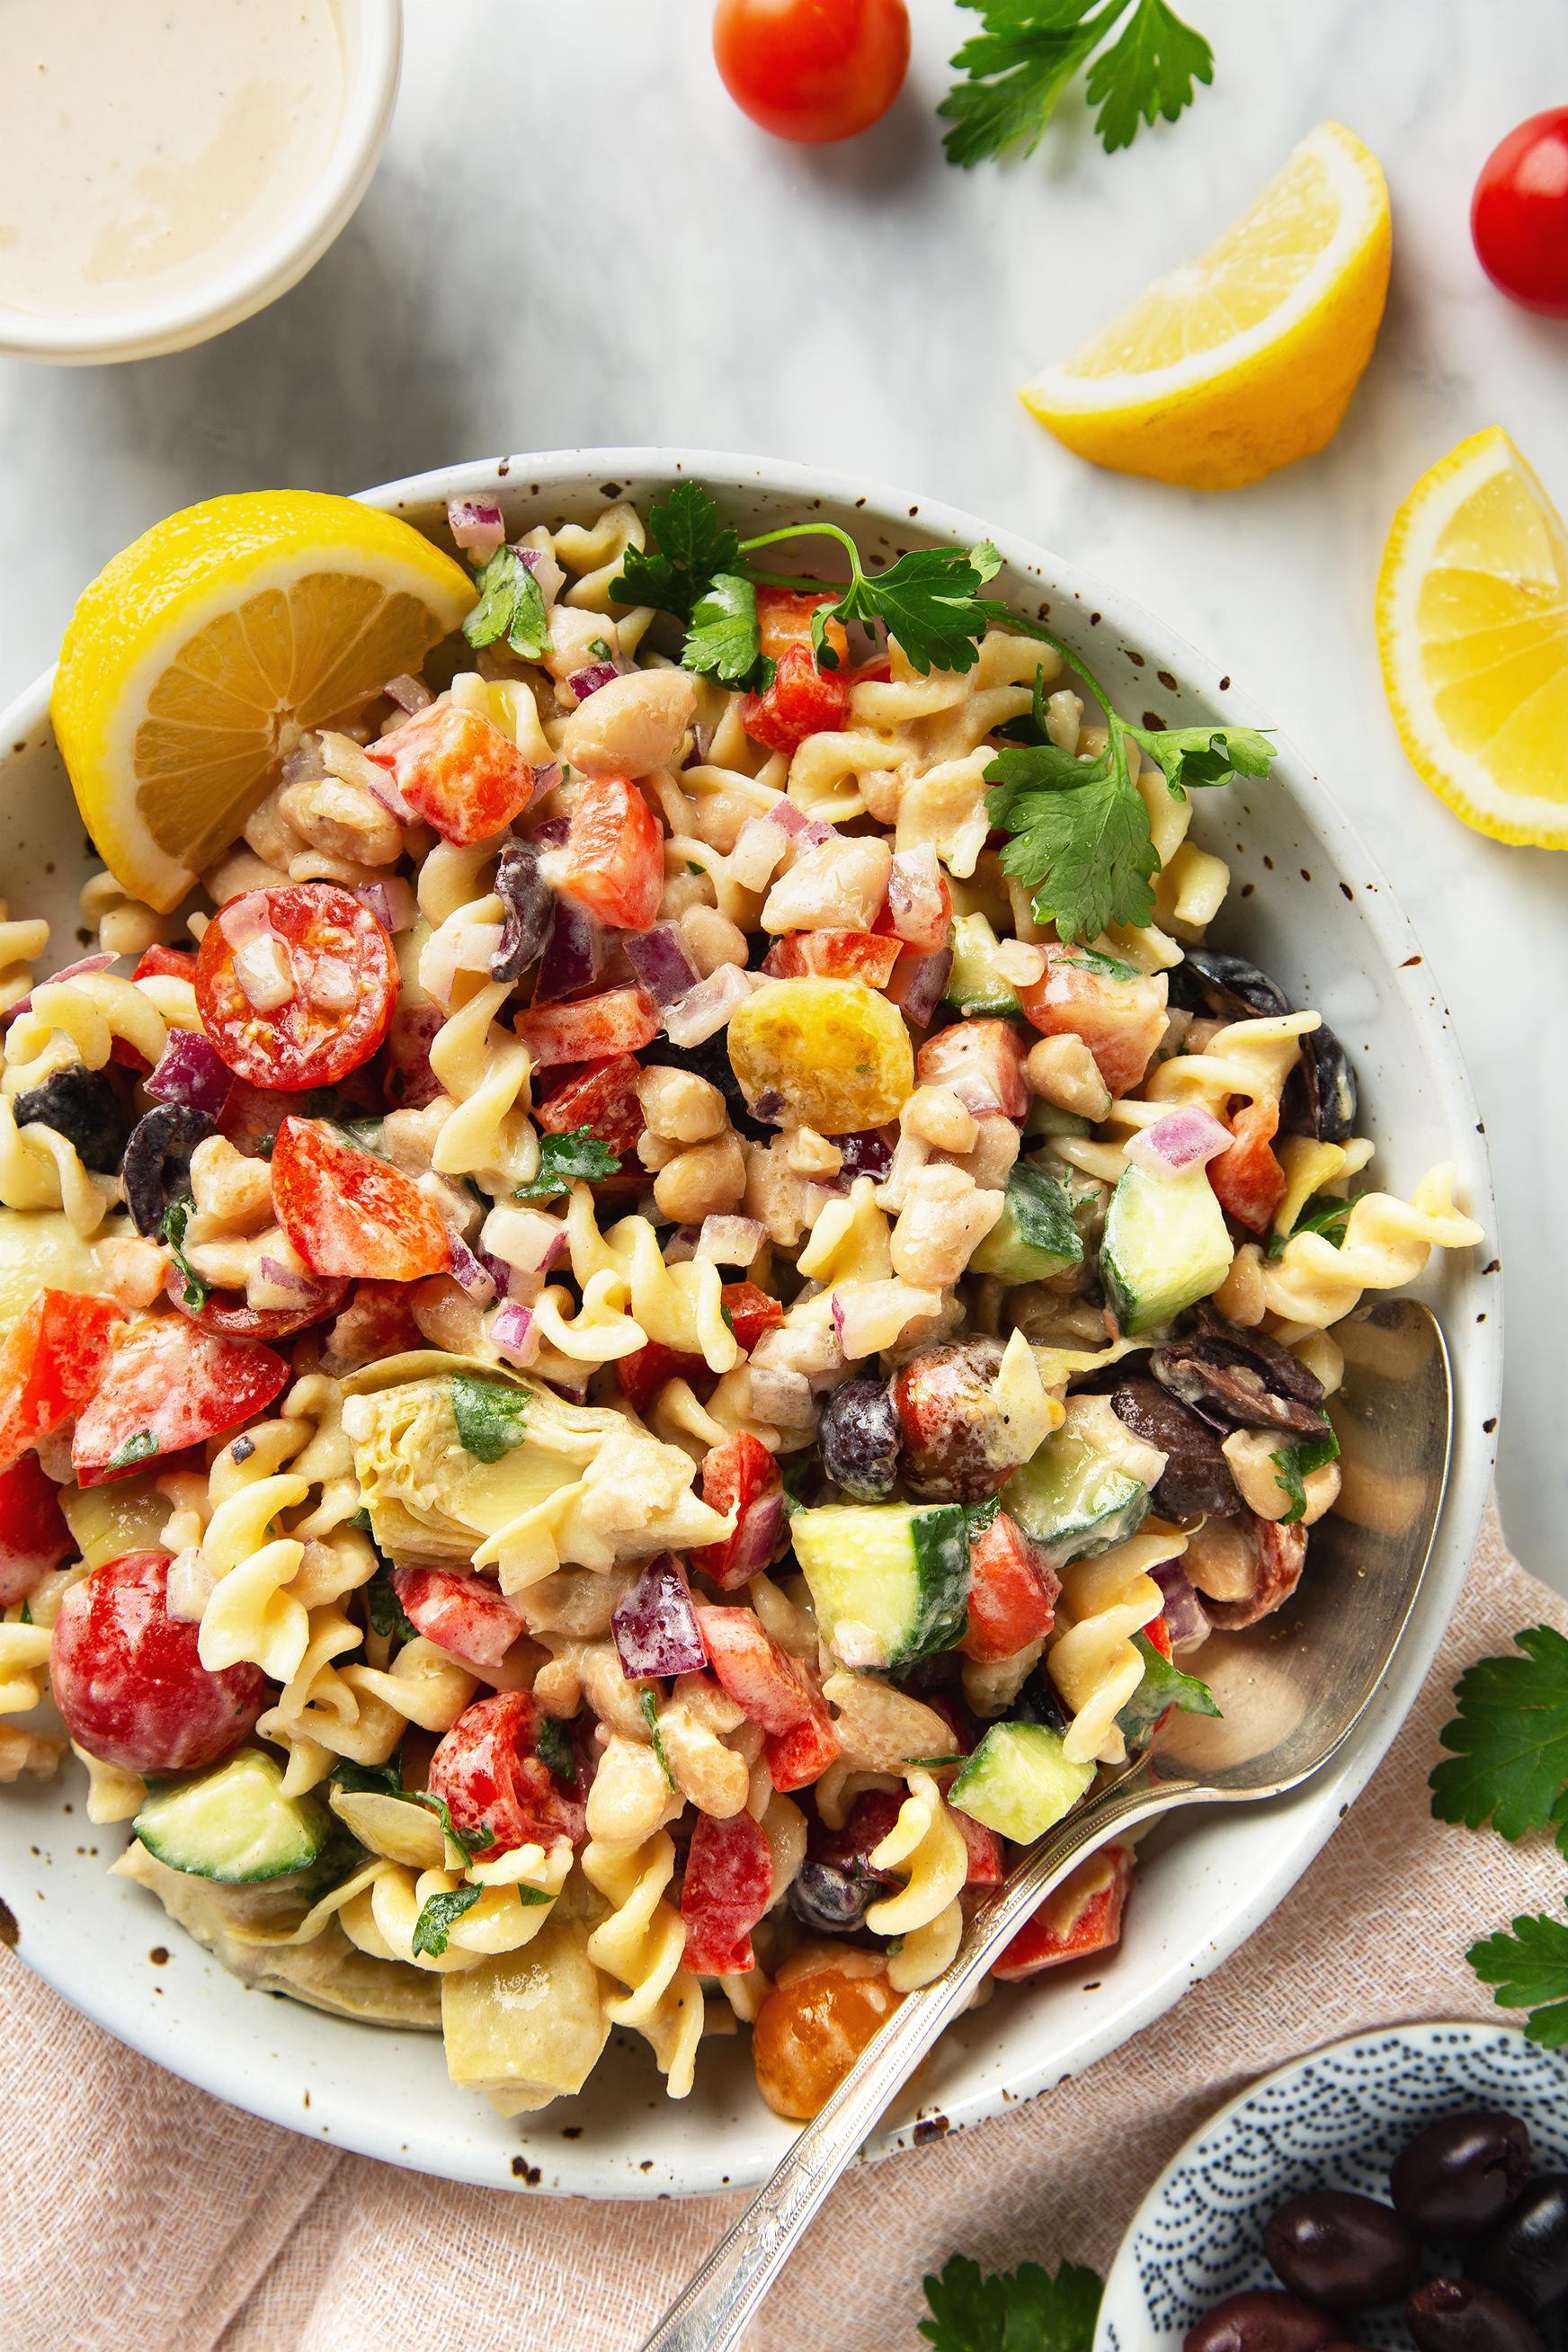 30-Minute Creamy Tahini Pasta Salad (Vegan & Gluten-Free!)   picklesnhoney.com #tahini #pasta #salad #side #main #lunch #dinner #recipe #vegan #glutenfree